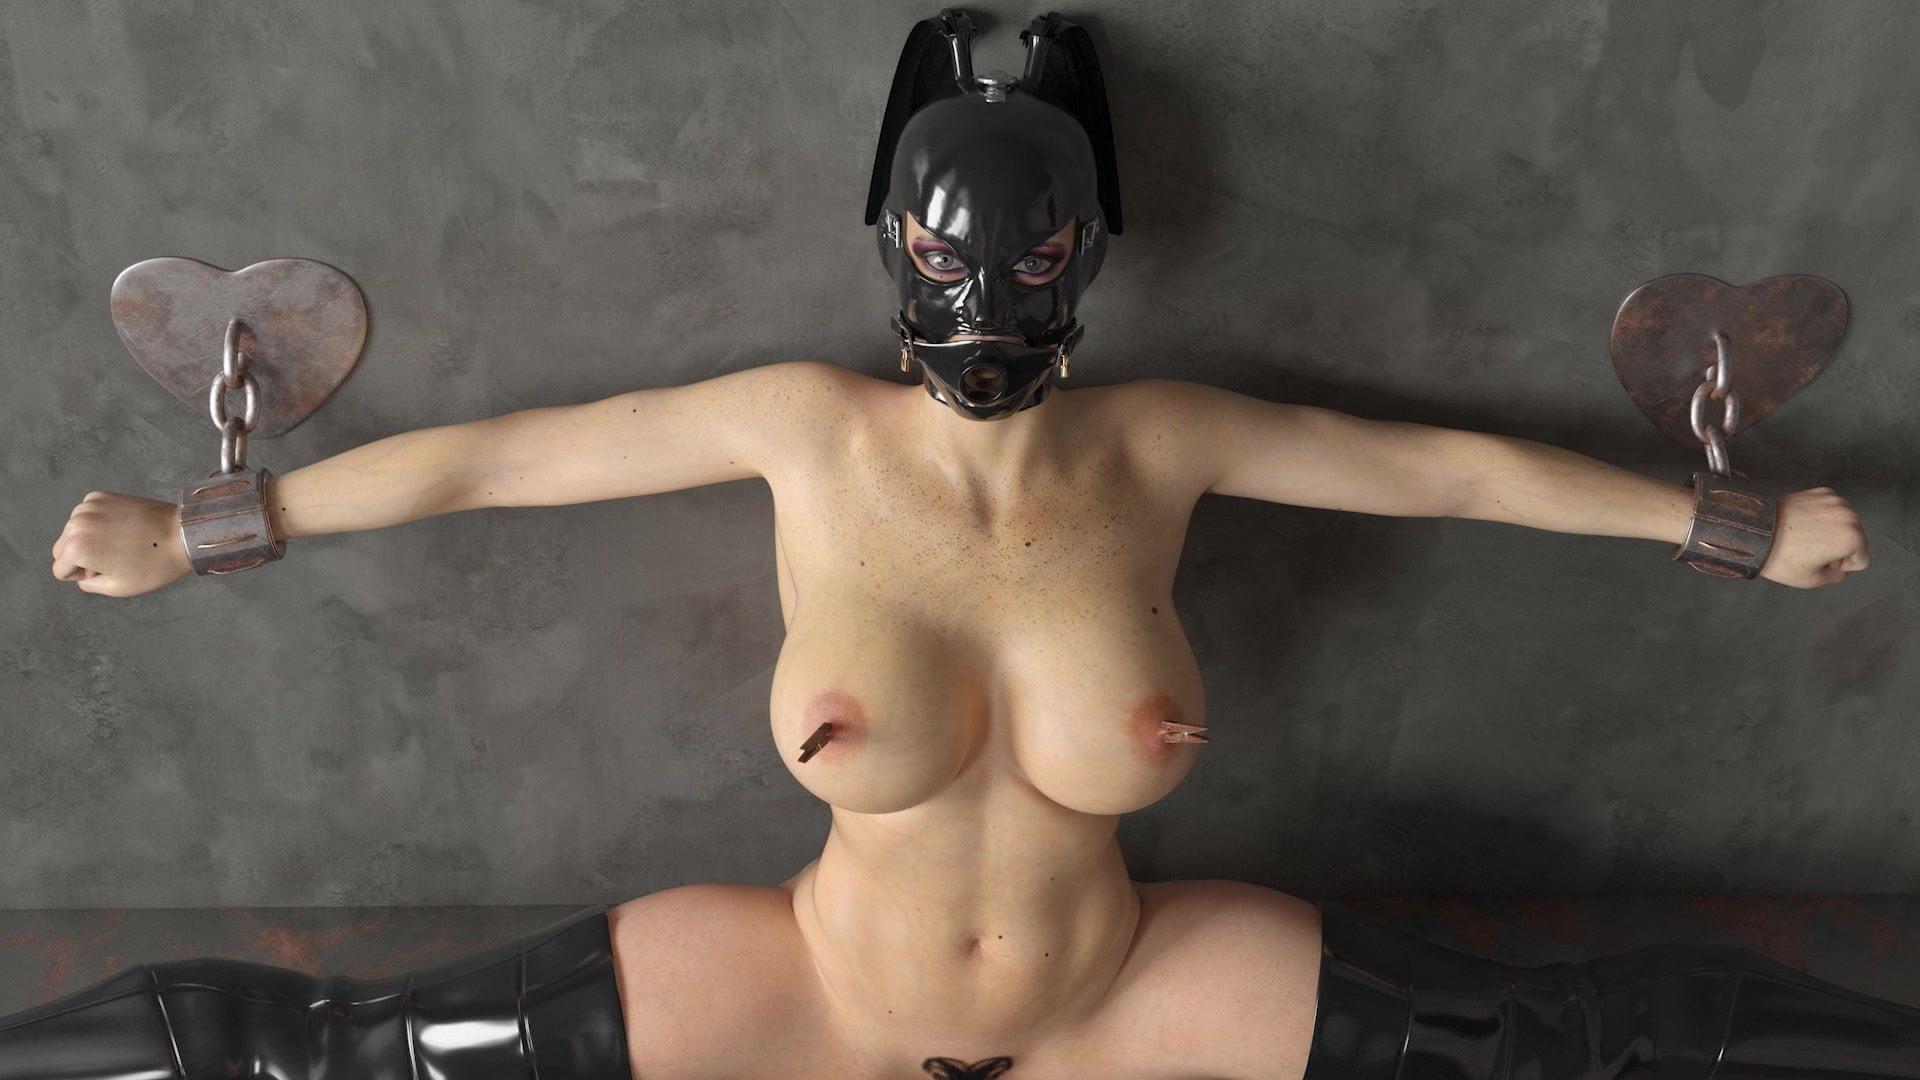 Porn bdsm hd